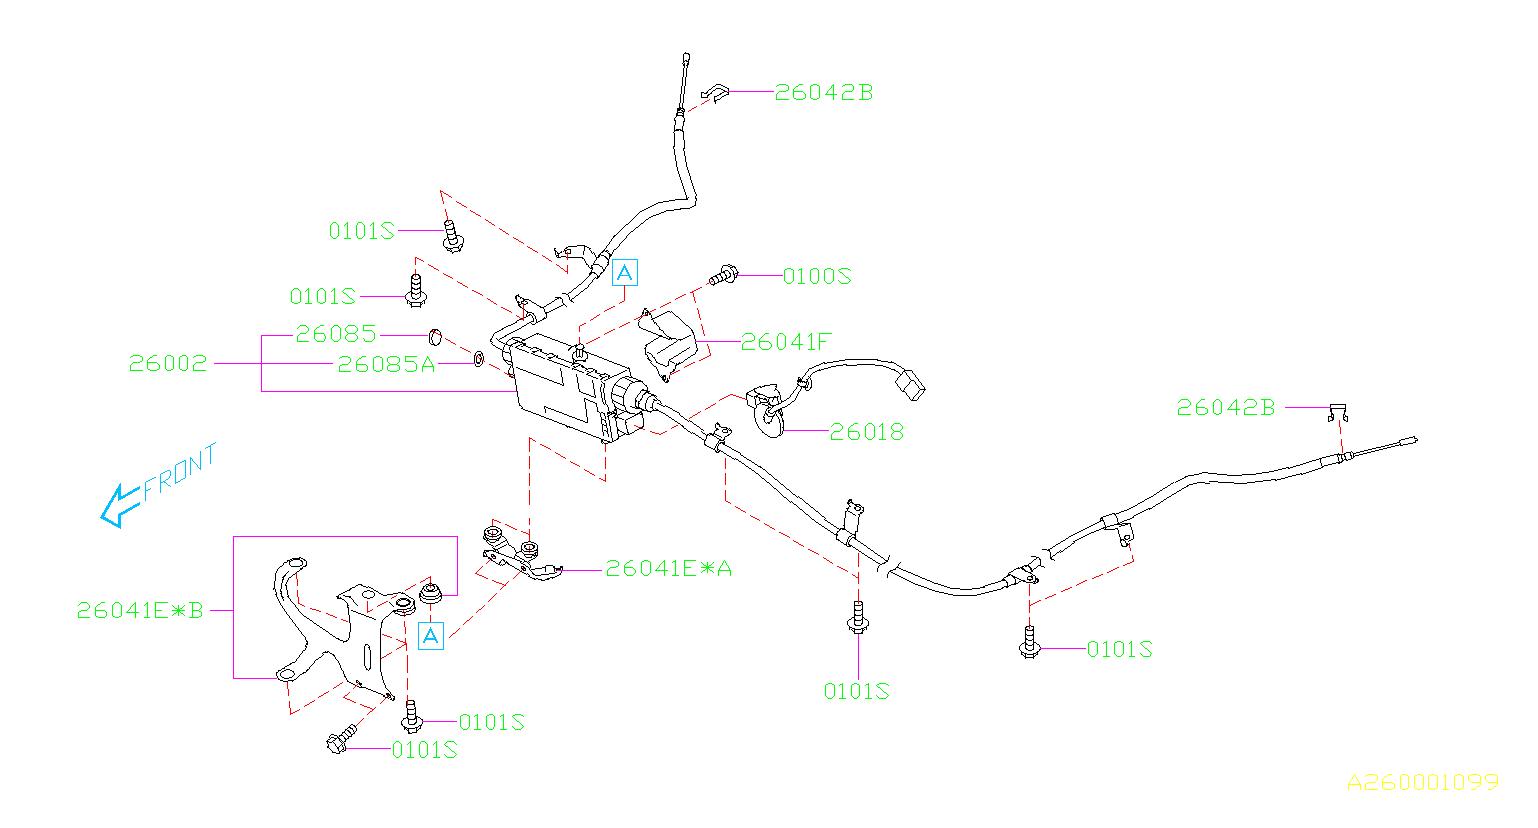 26002aj01c - Parking Brake Cable